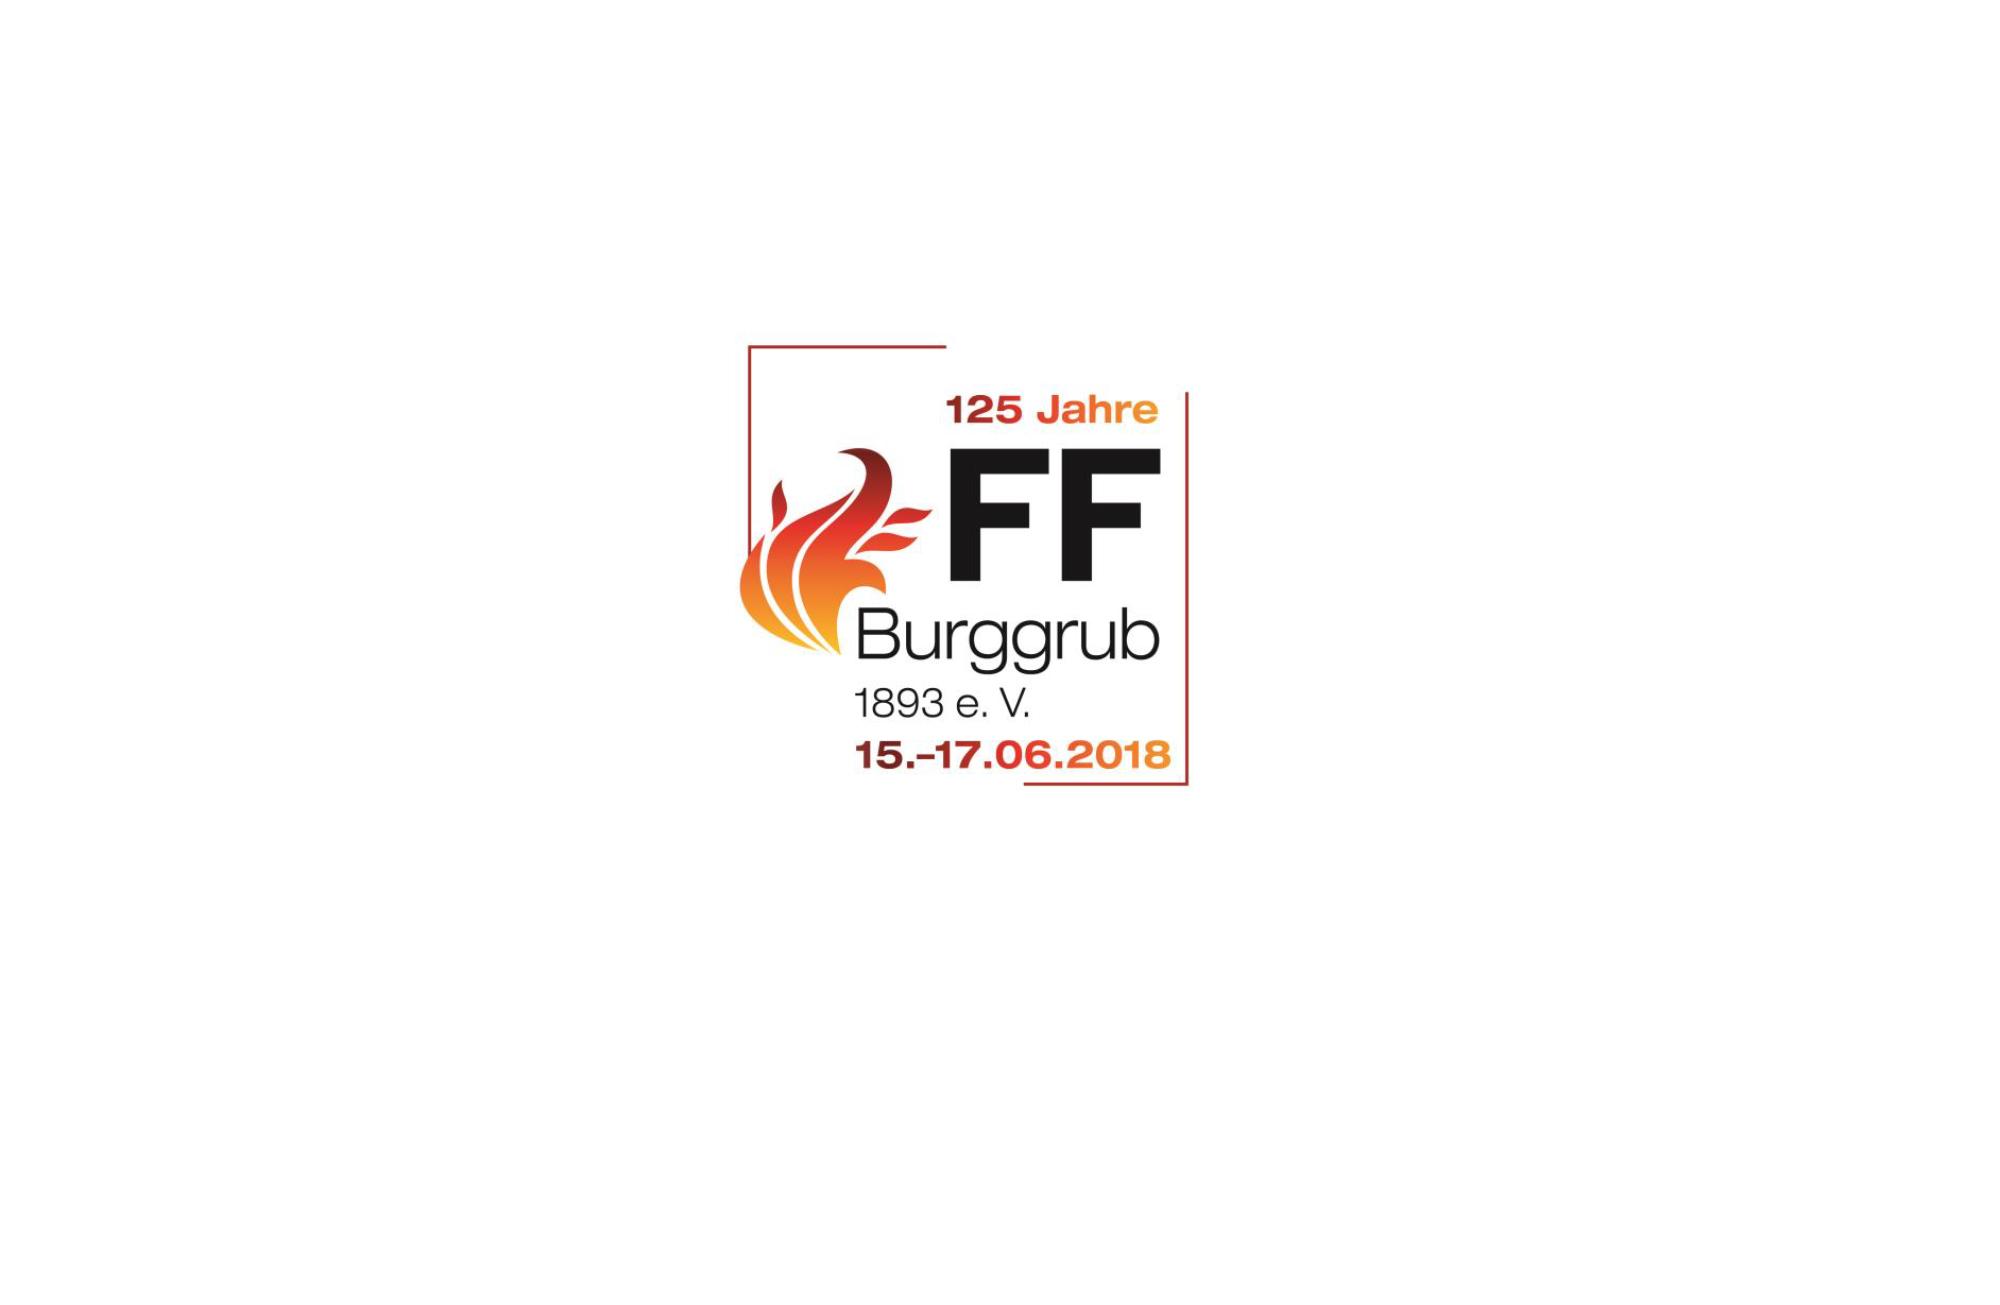 Freiwillige Feuerwehr Burggrub e. V.